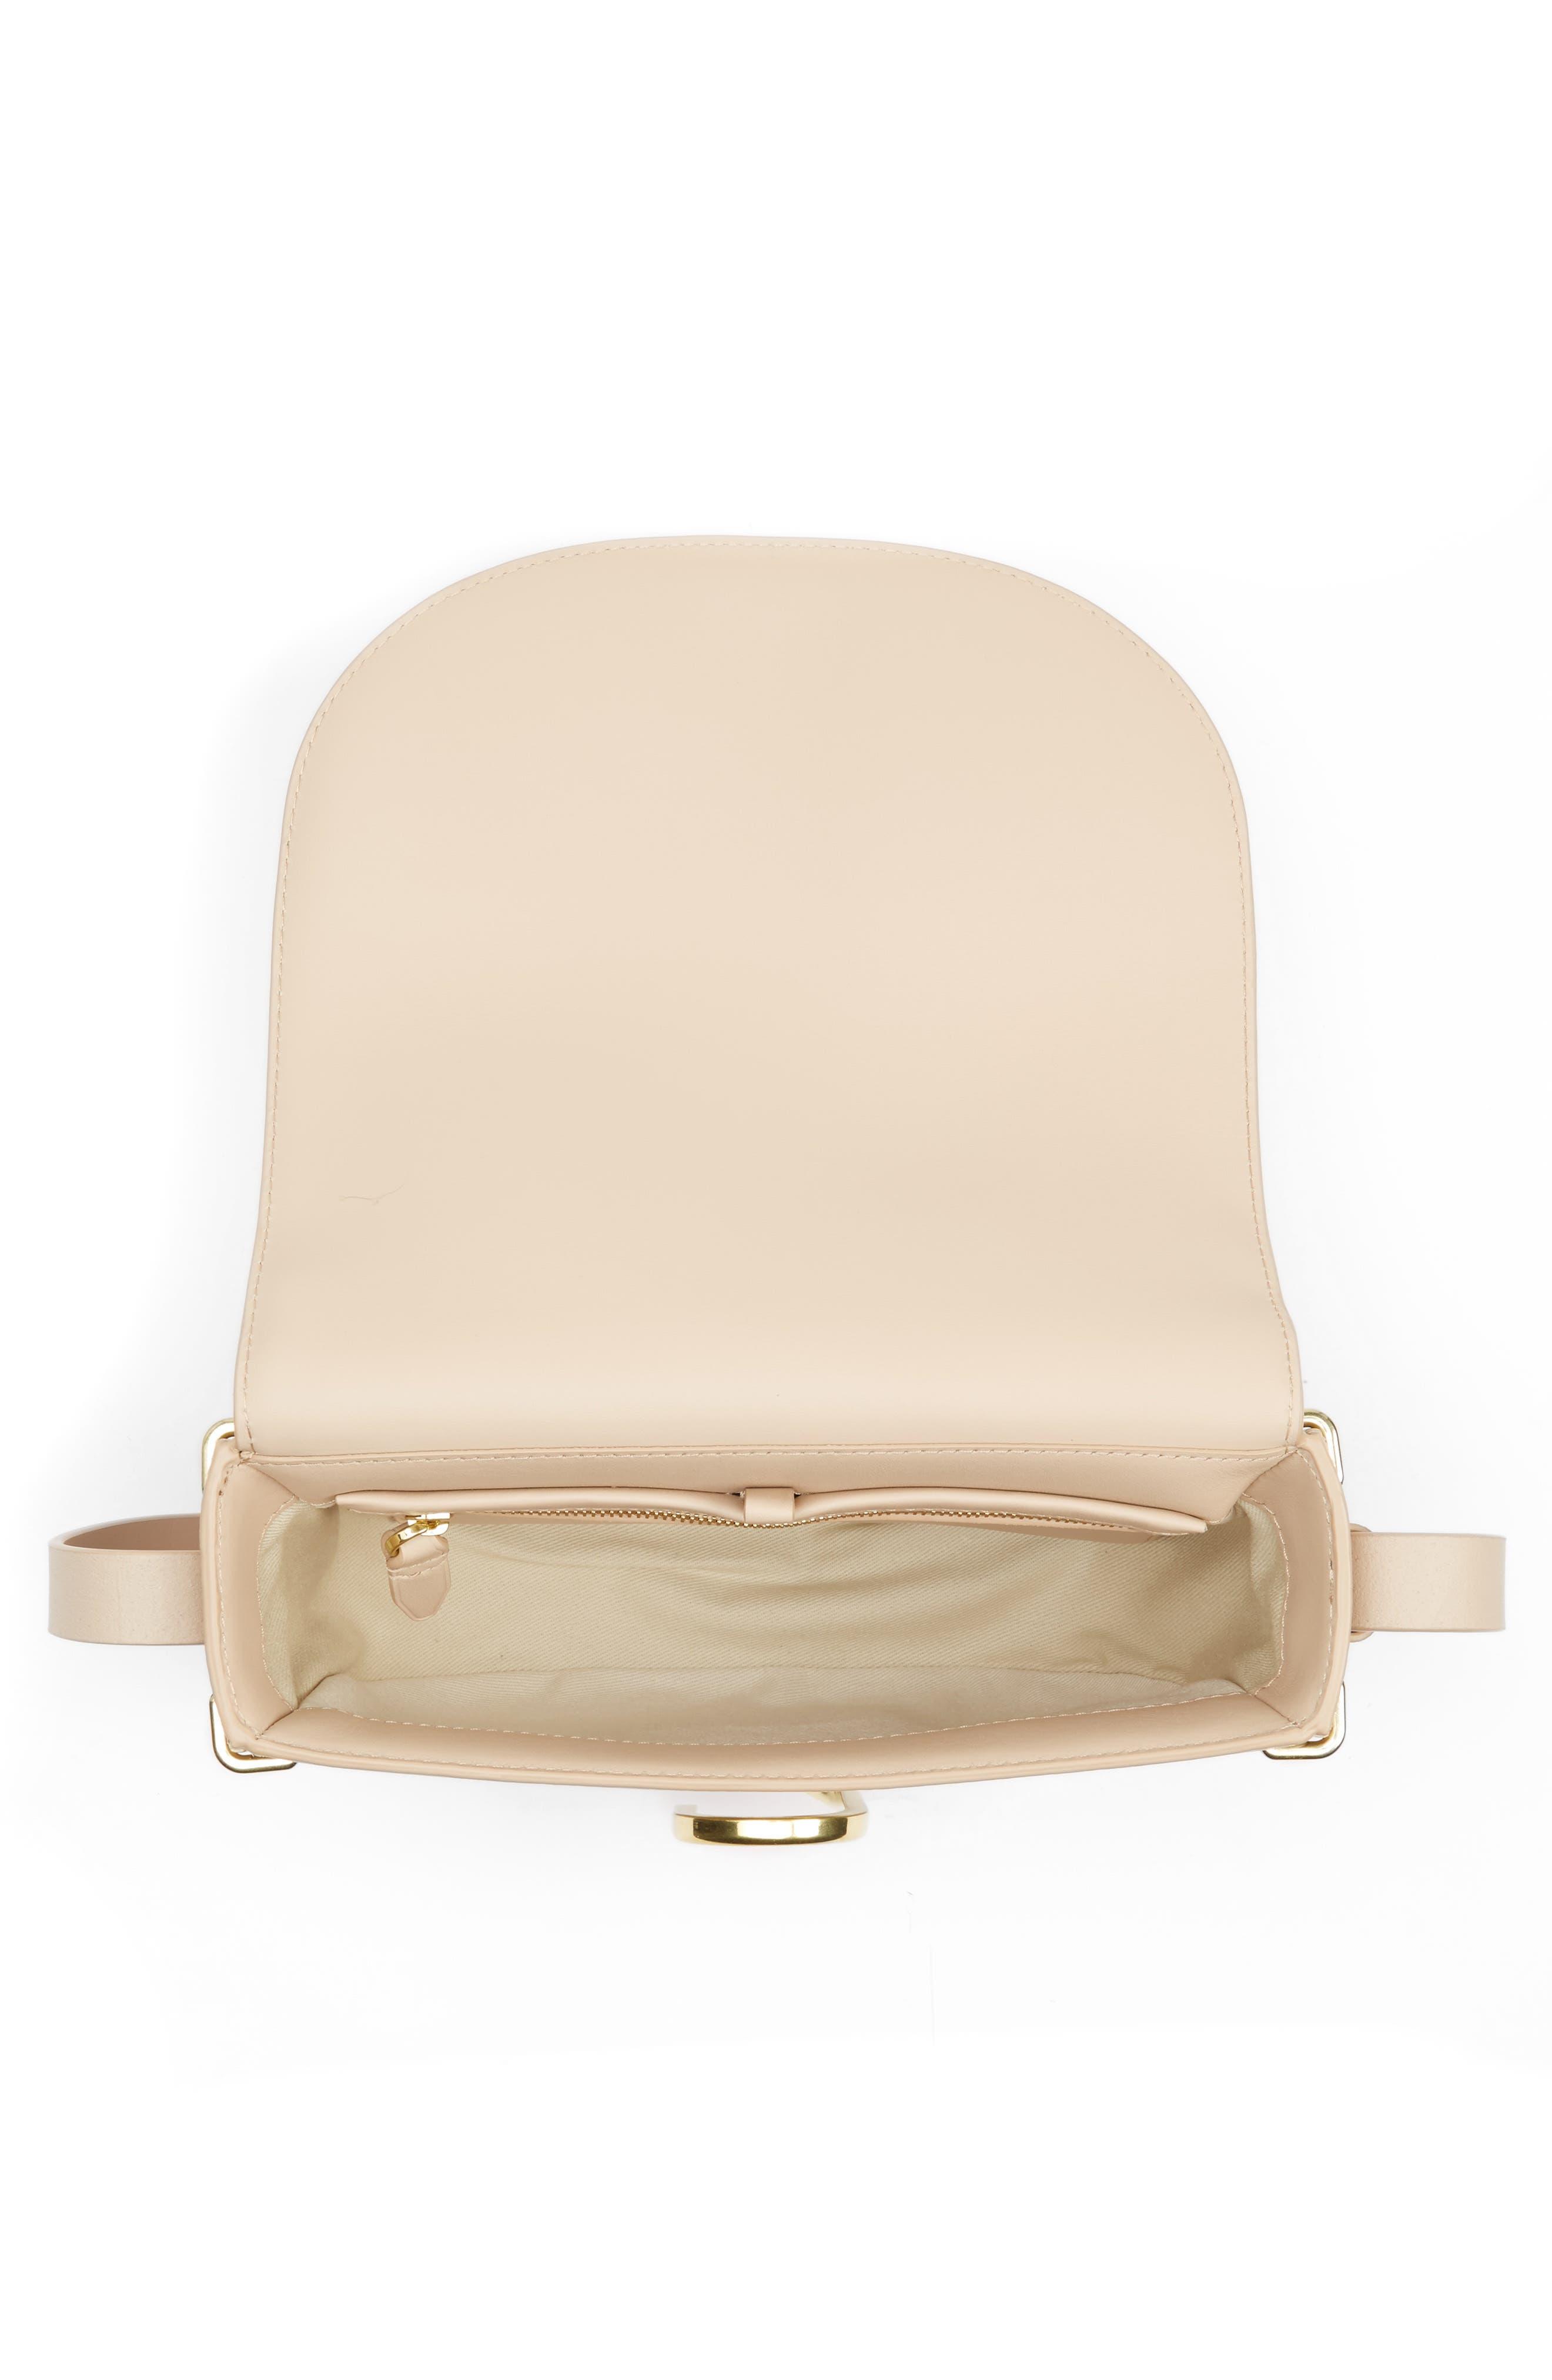 Alix Leather Saddle Bag,                             Alternate thumbnail 3, color,                             Cashew/ Gold